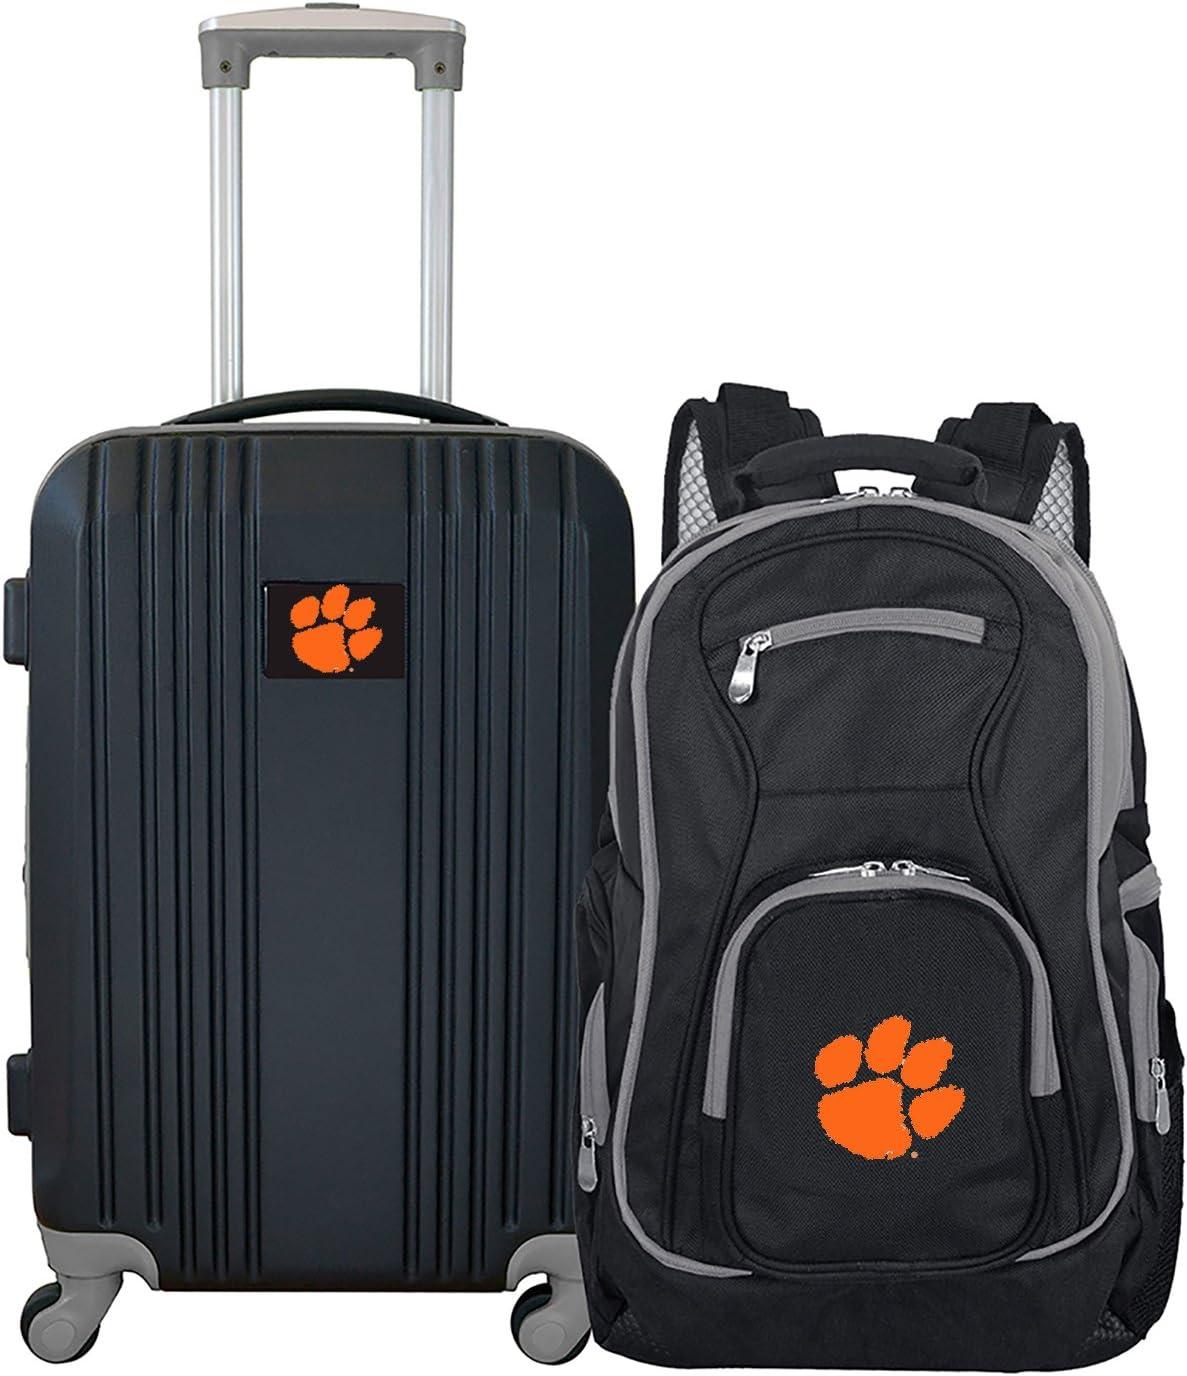 NCAA 2-Piece Luggage Set